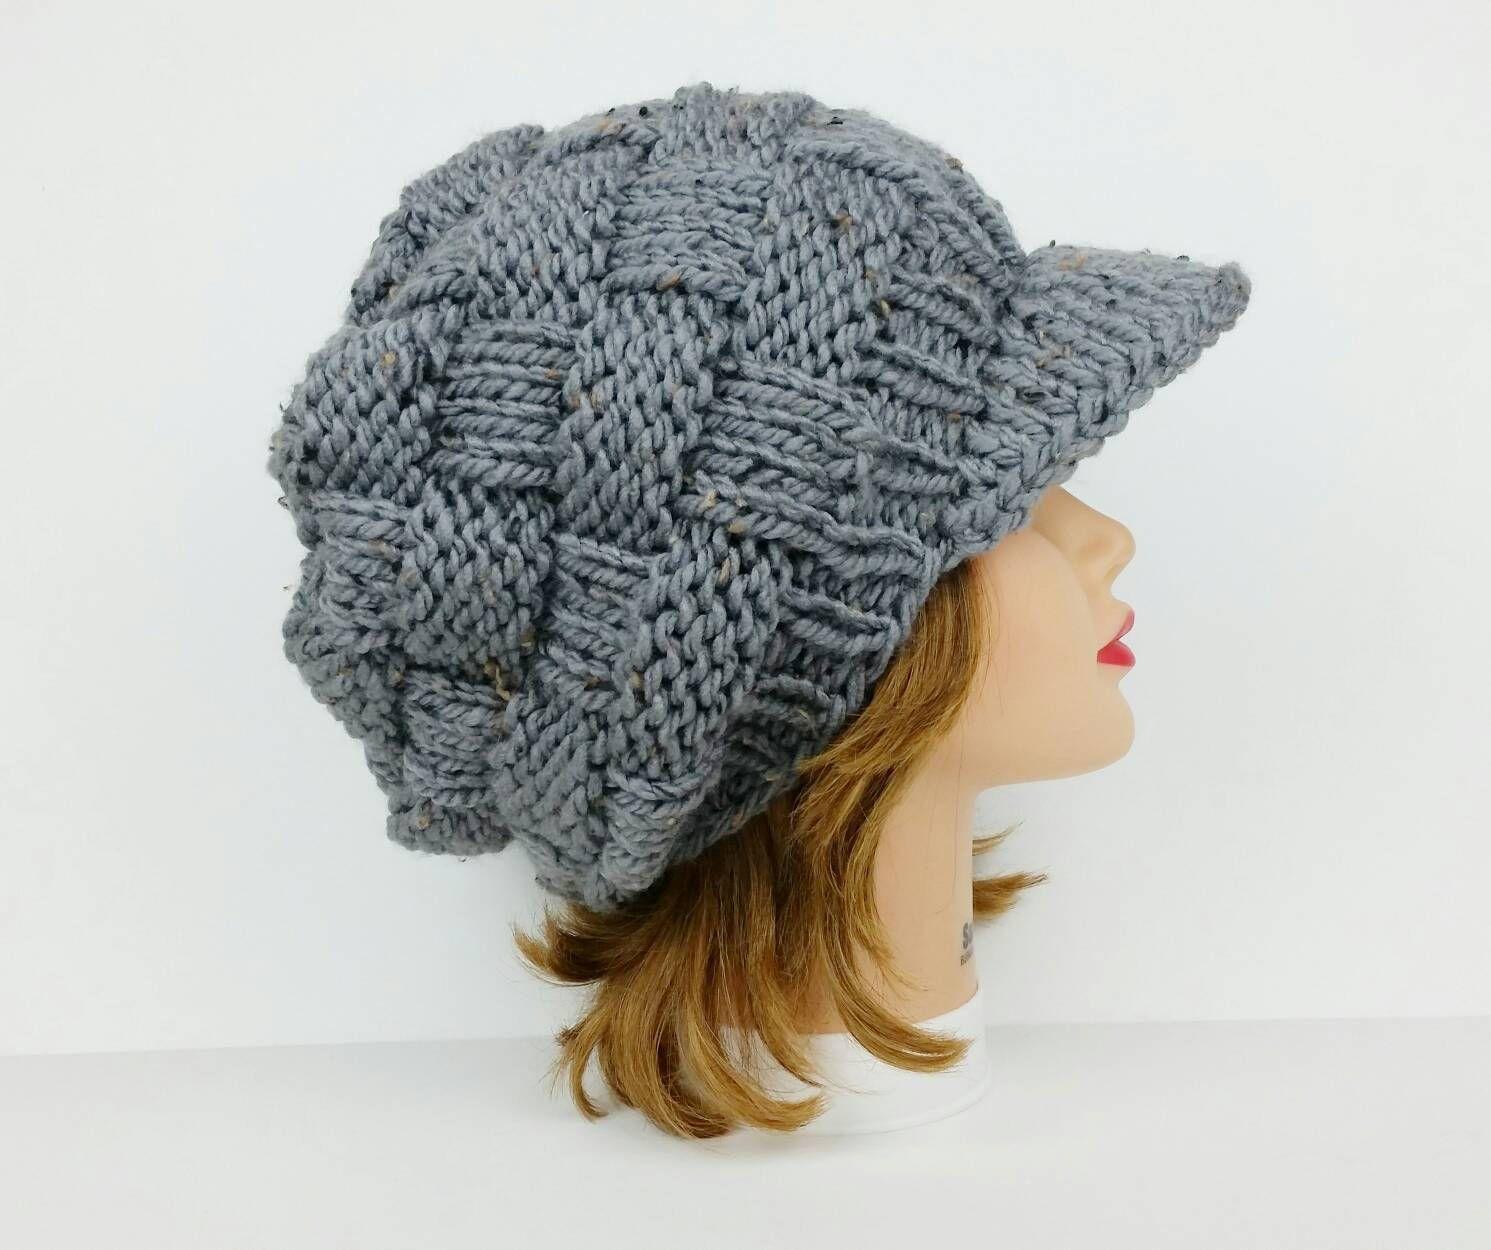 DERUI CREATION Newsboy Caps for Women Fashion Visor Knit Hat with Brim Woolen Hats Satin Lined Winter Costume